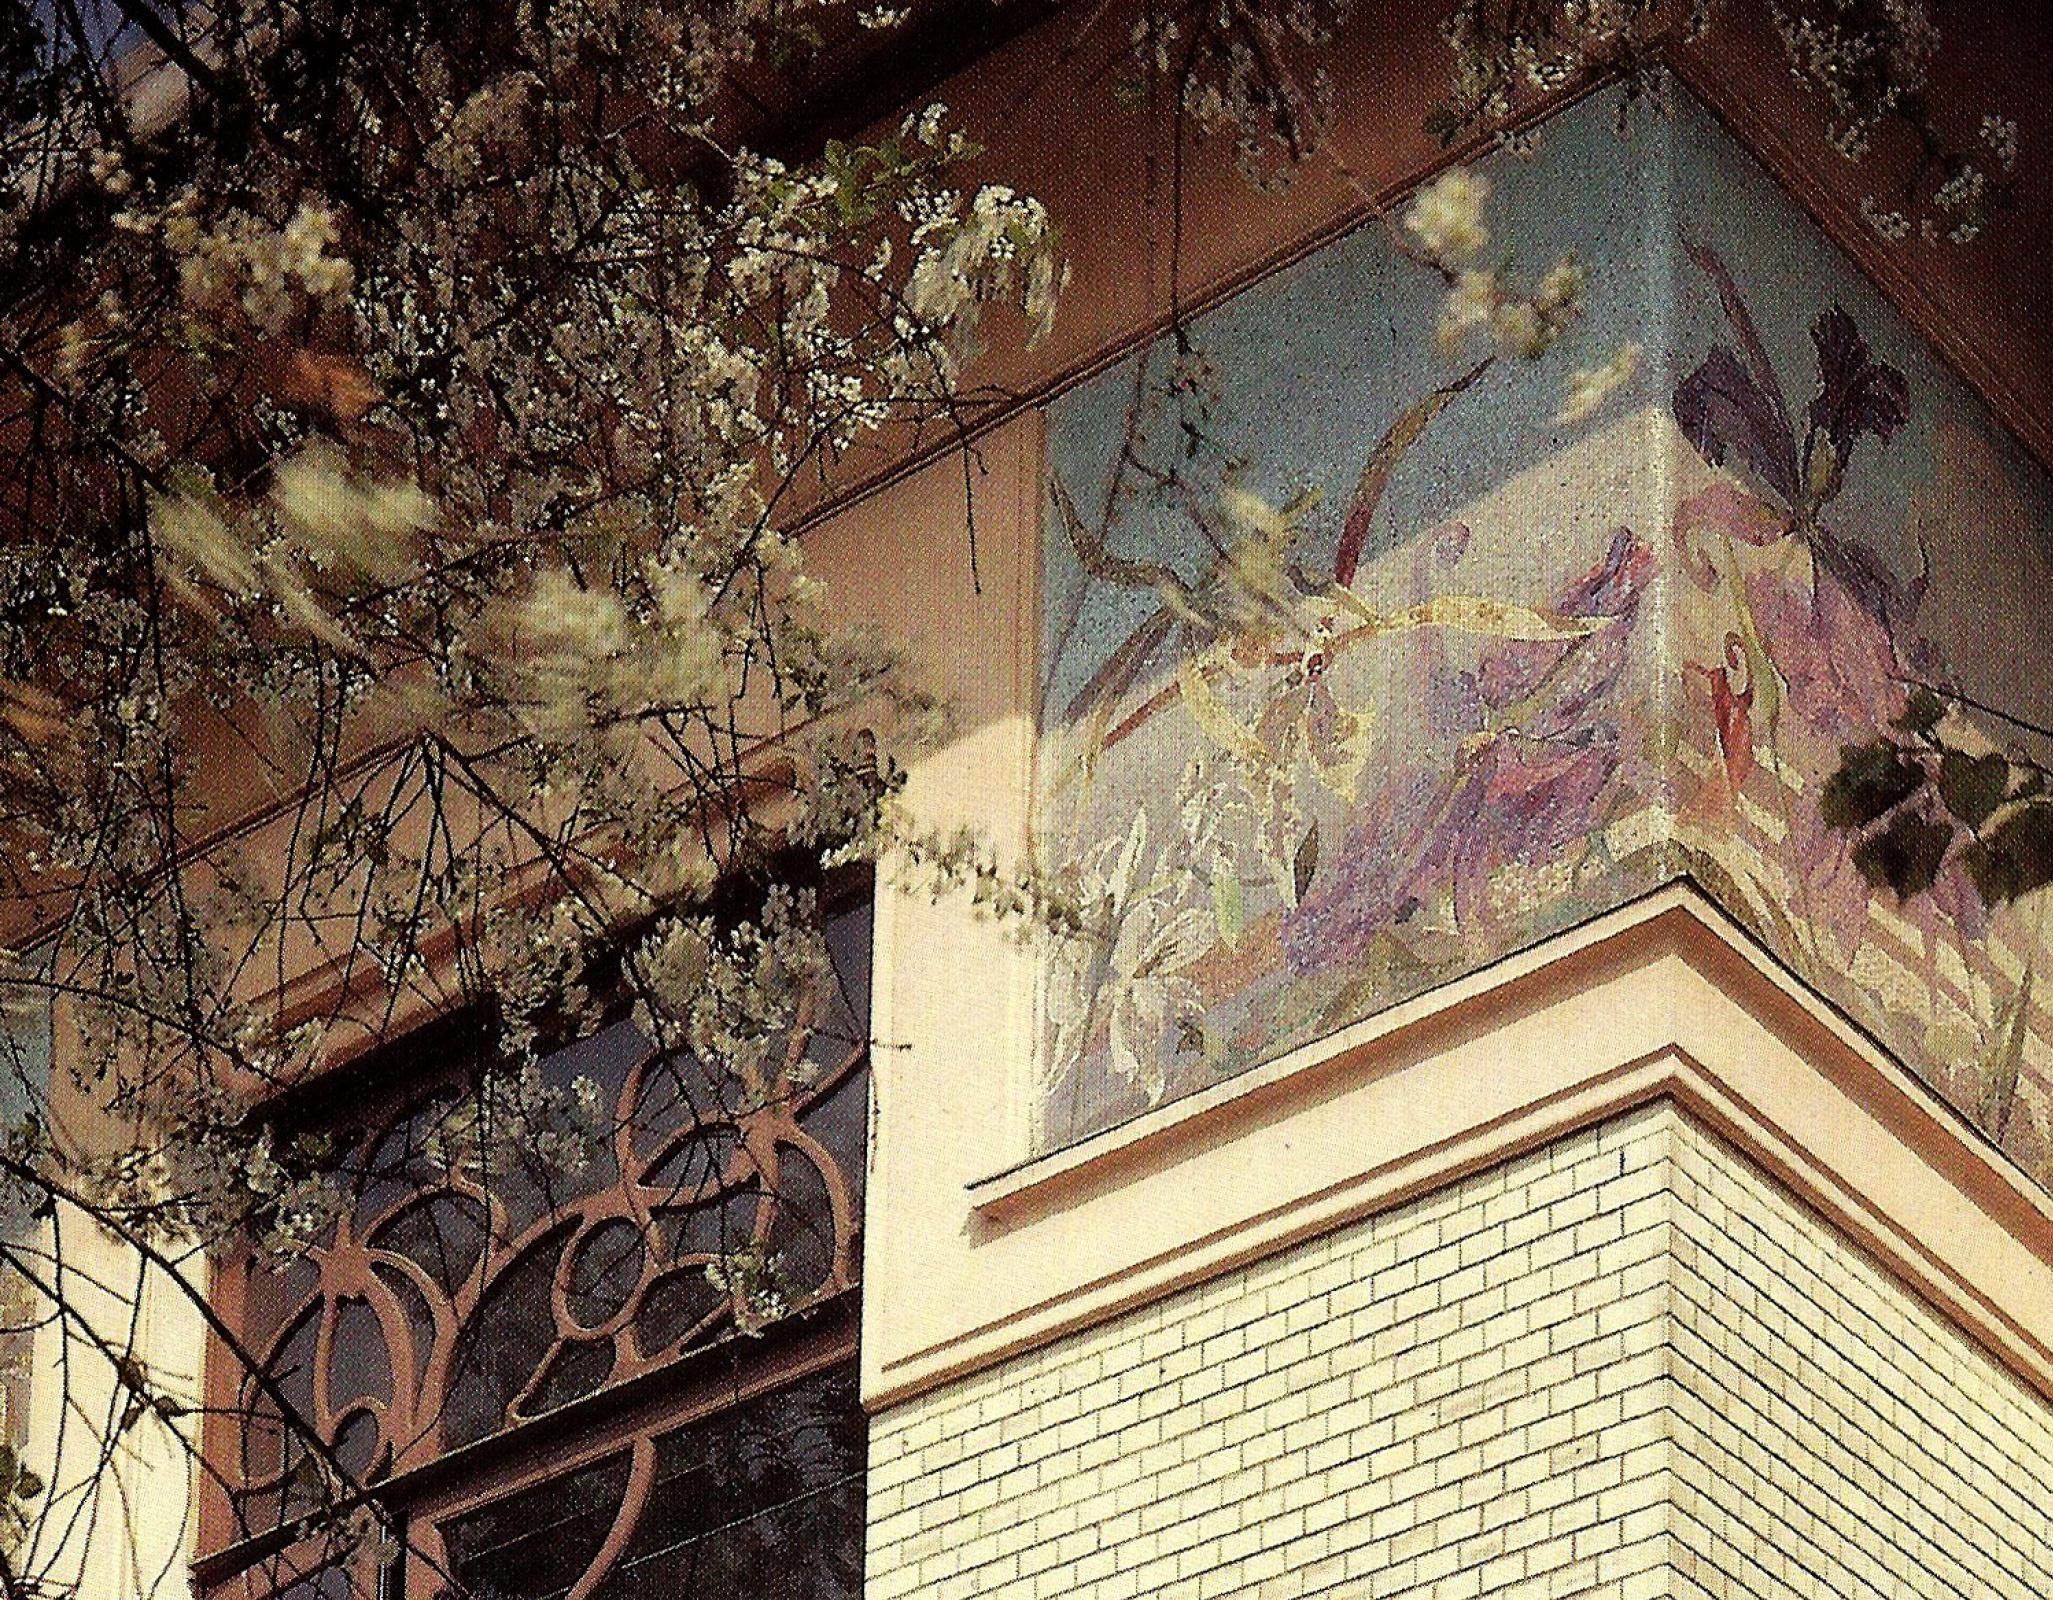 Ryabushinsky mansion. Frieze detail.